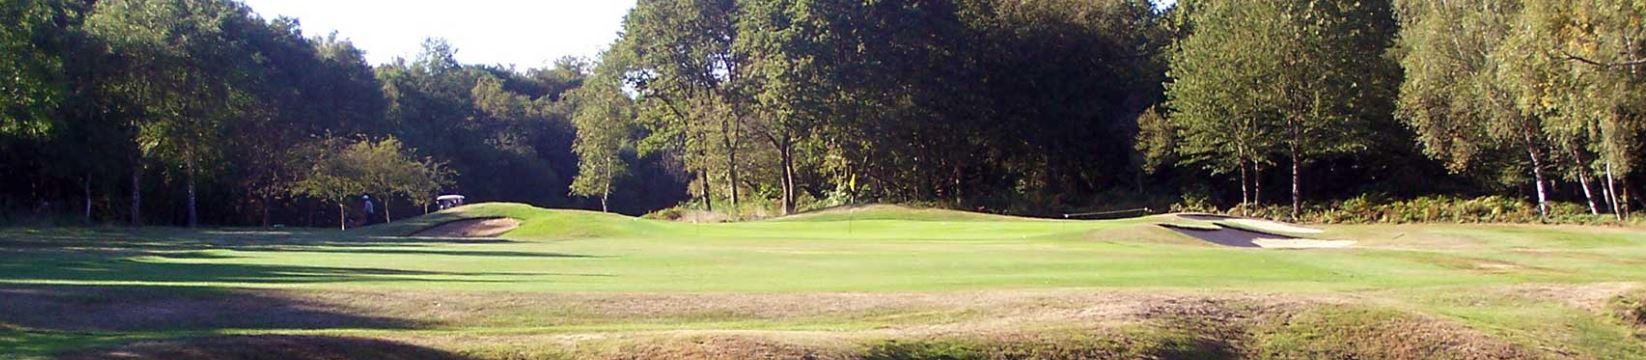 West Herts Golf Club Capture